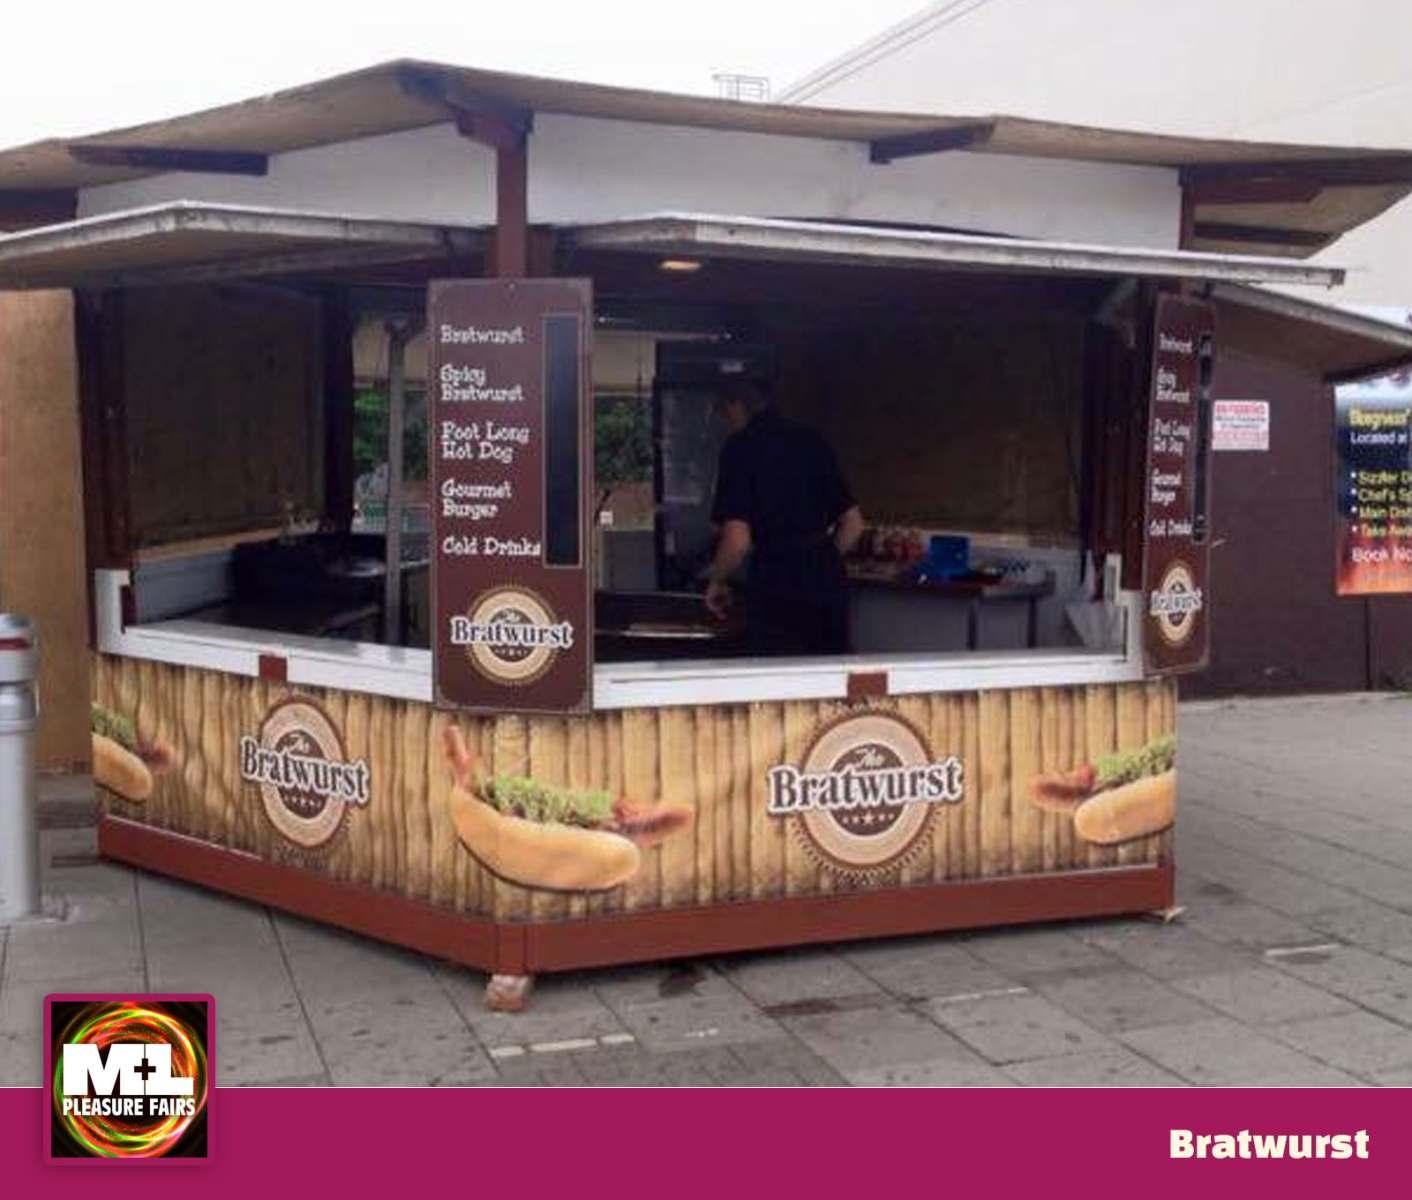 Bratwurst Stall Image